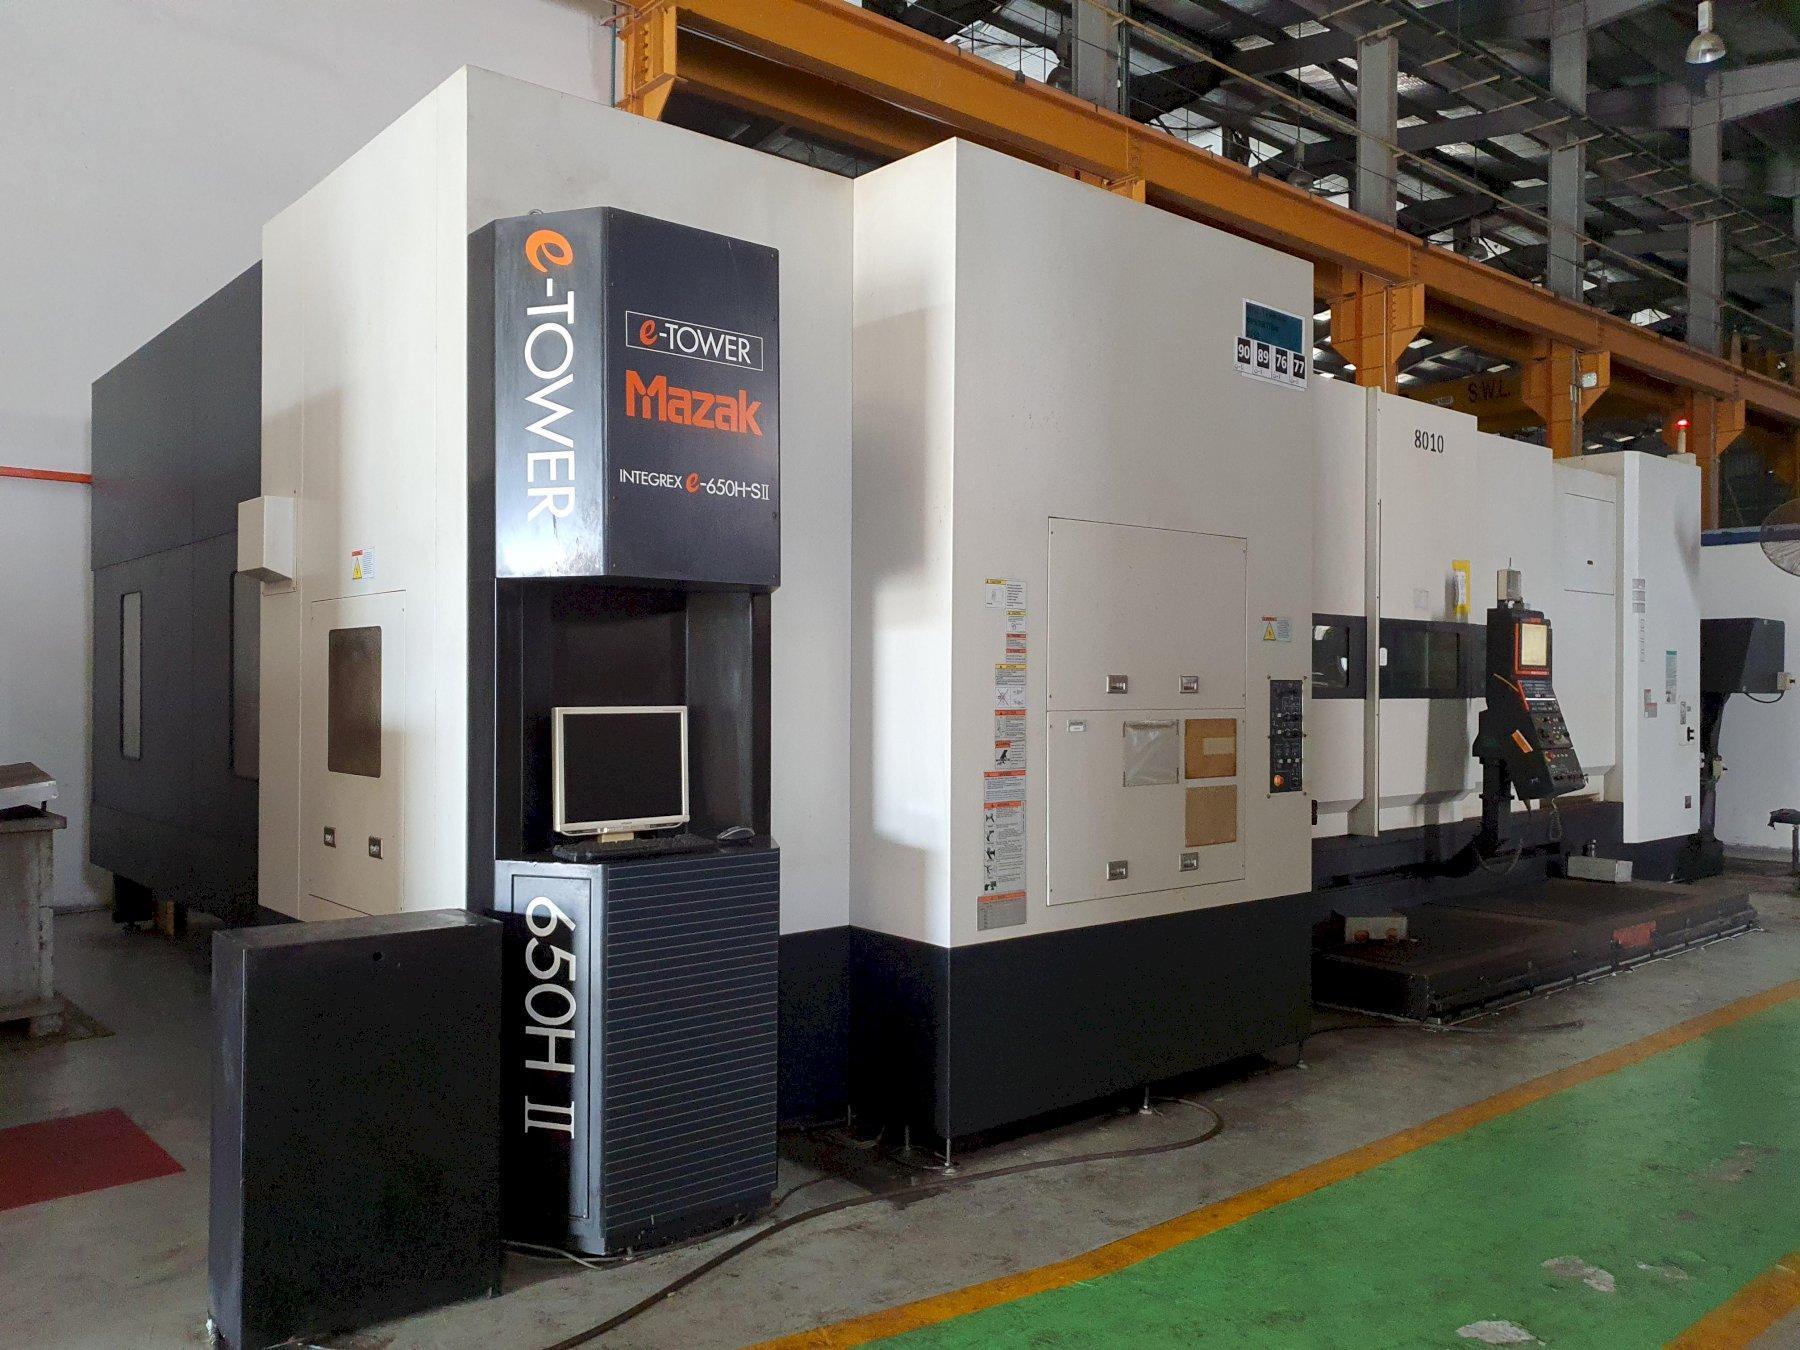 Mazak Integrex e650H-S/3000 II CNC Mill/Turn Horizontal Lathe (2011)